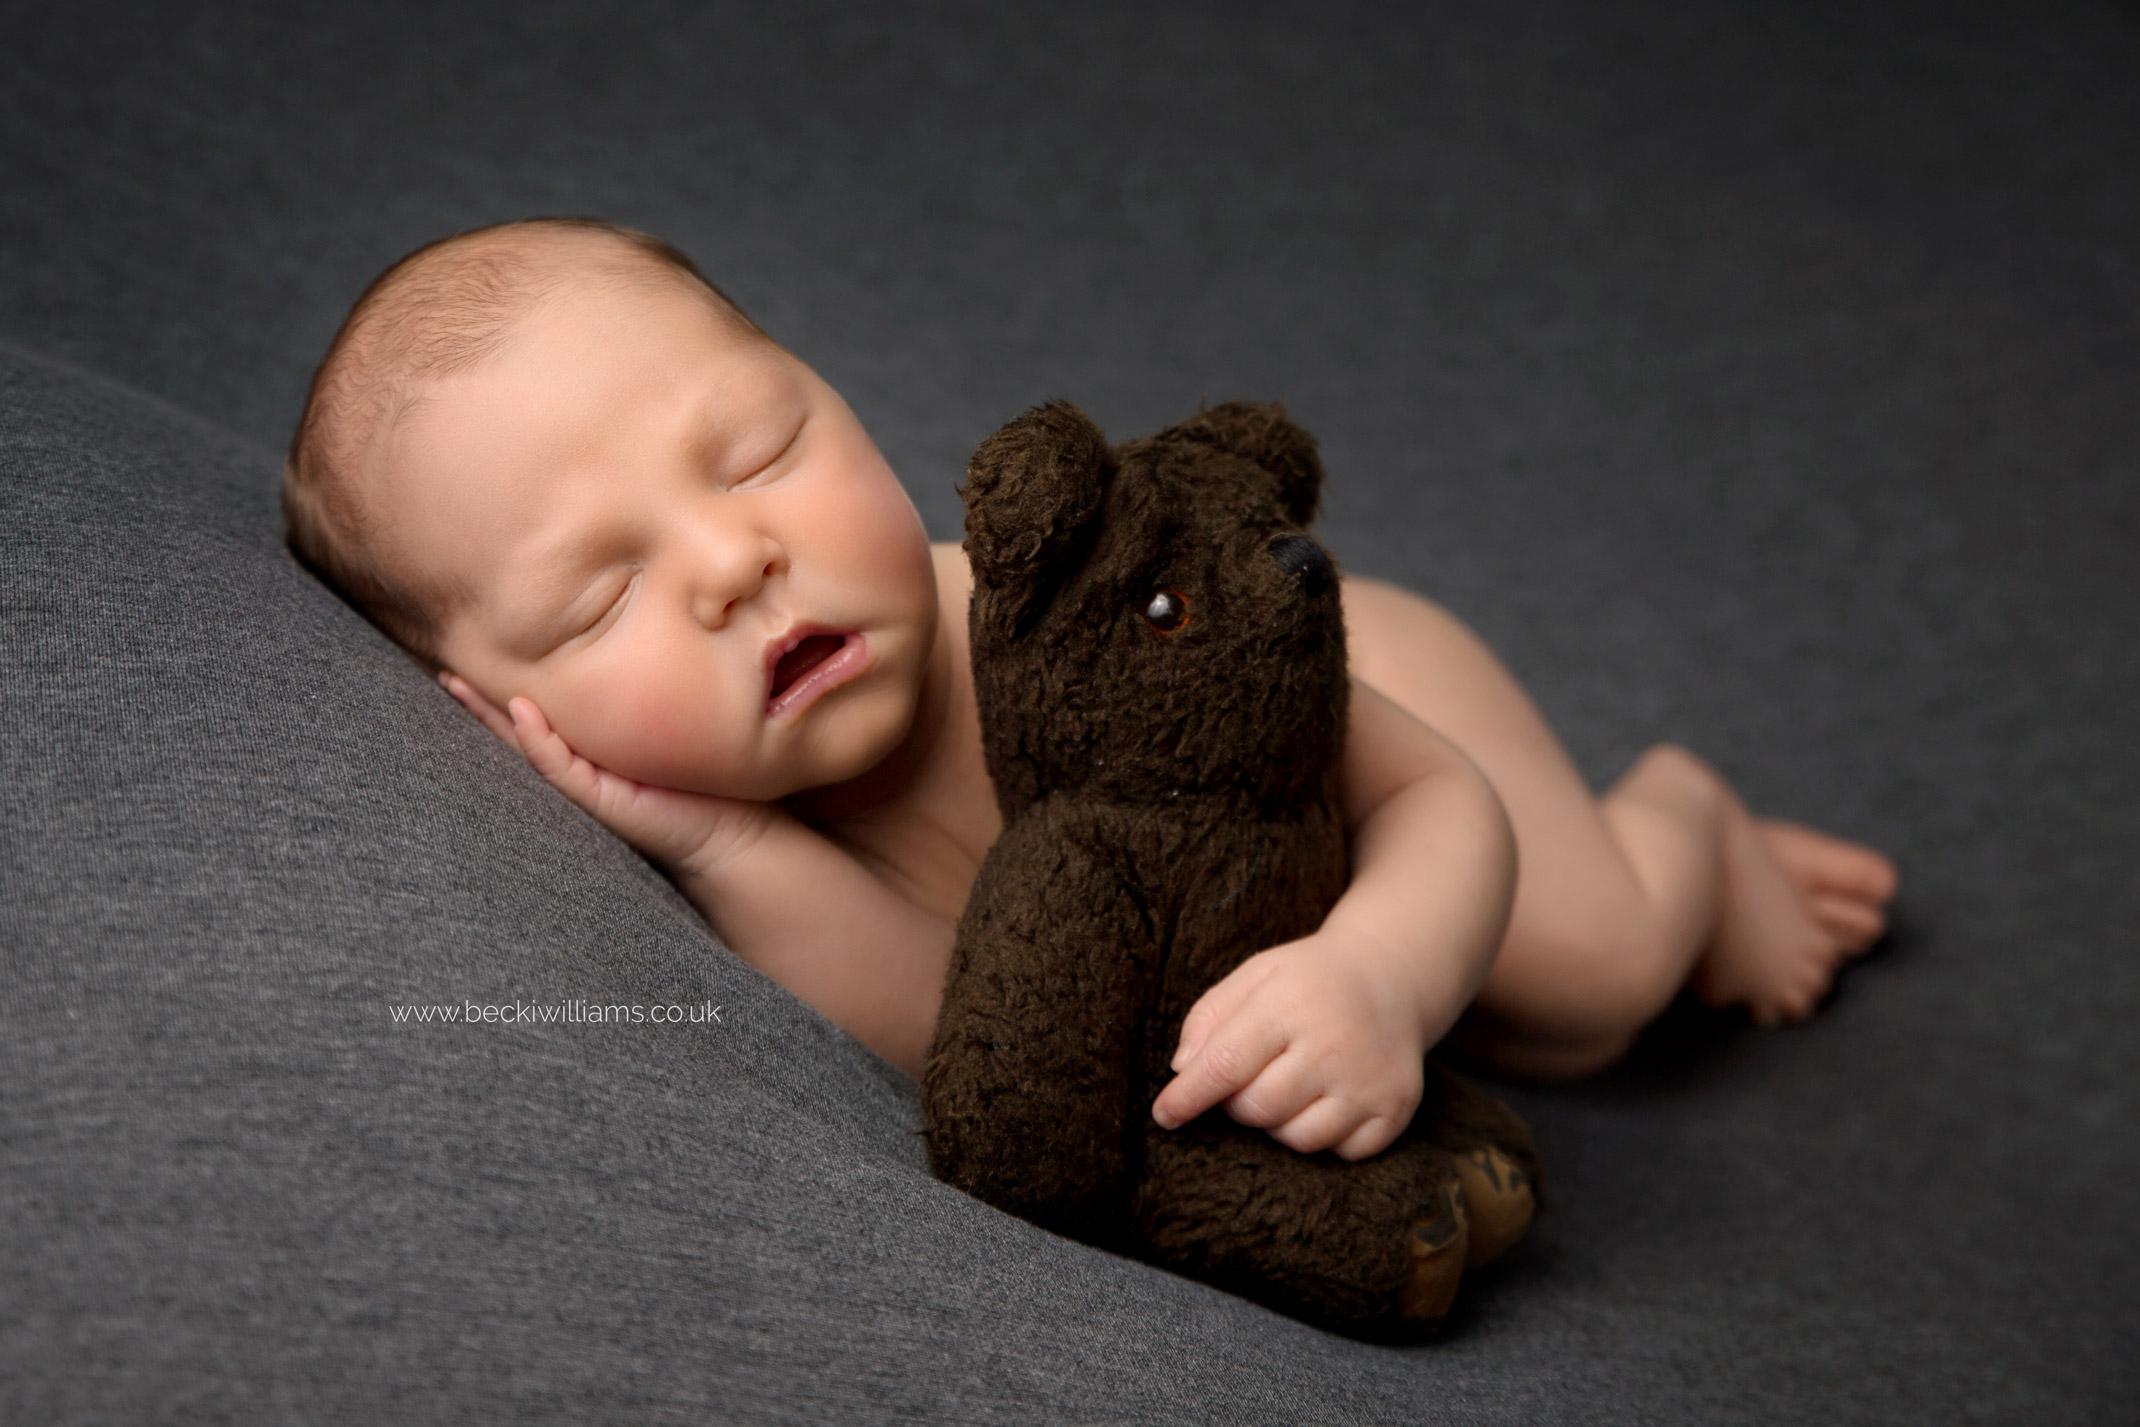 newborn-photographer-in-hertfordshire-boy-cute-asleep-bear.jpg